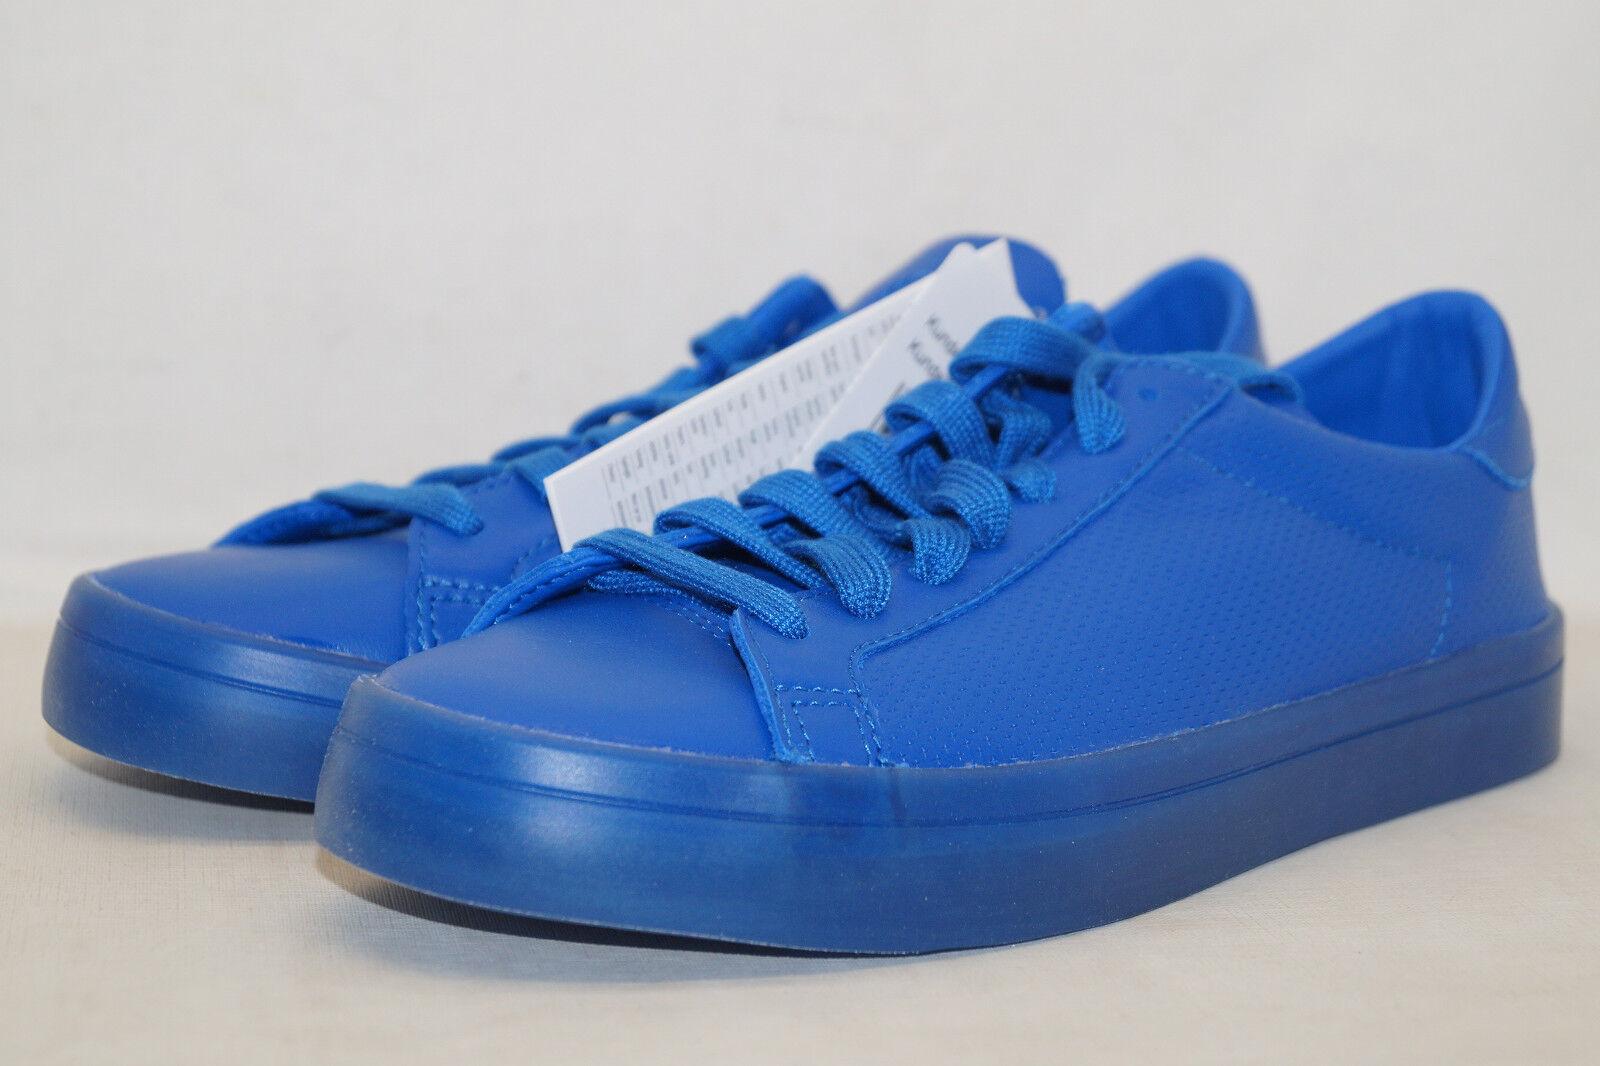 Adidas originals courtvantage adiFarbe EU 39.3 UK 6 blau all Blau S80252